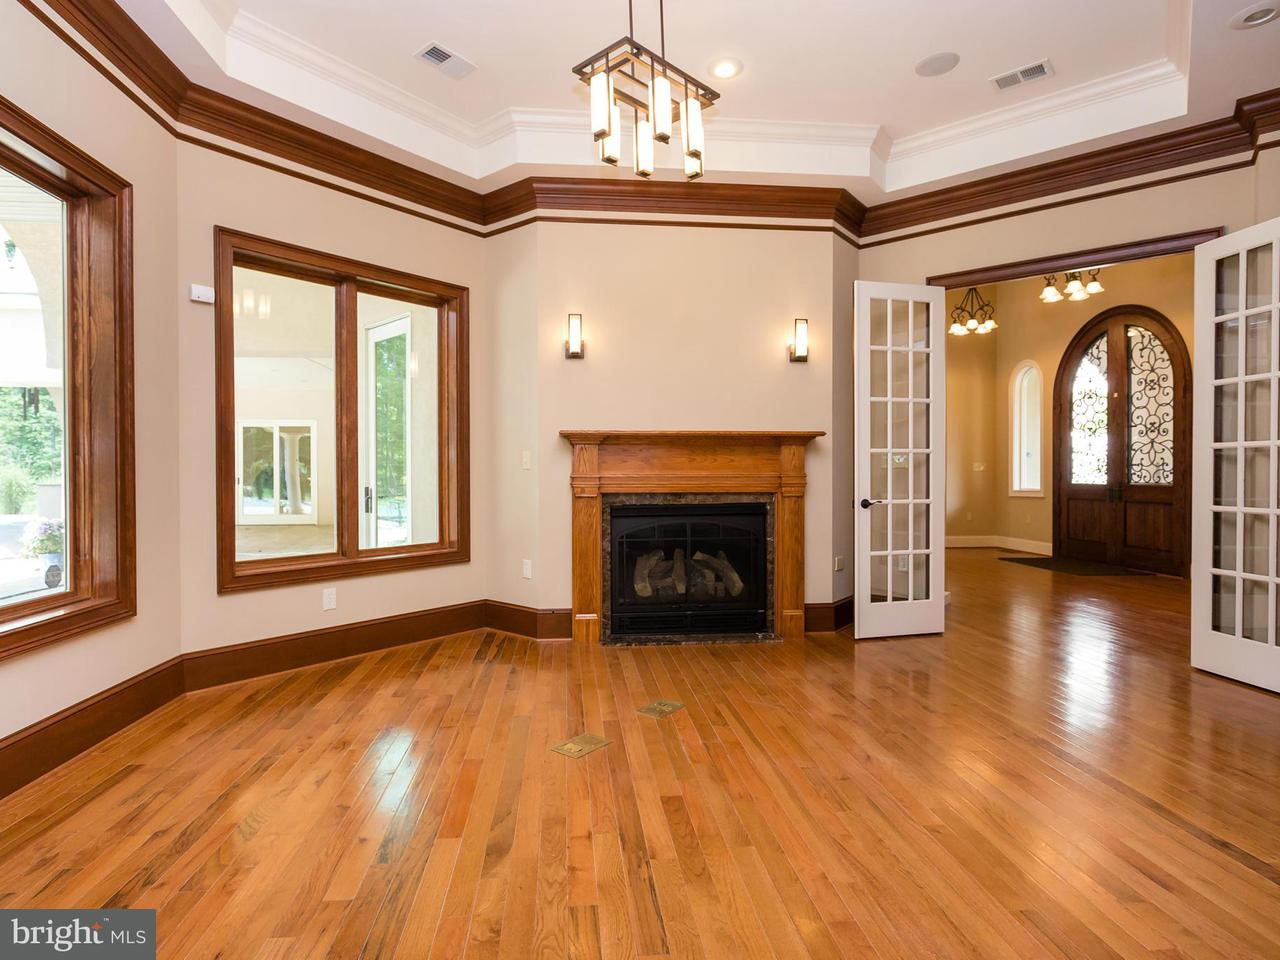 Additional photo for property listing at 328 STORCK Road 328 STORCK Road Fredericksburg, Virginia 22406 Stati Uniti